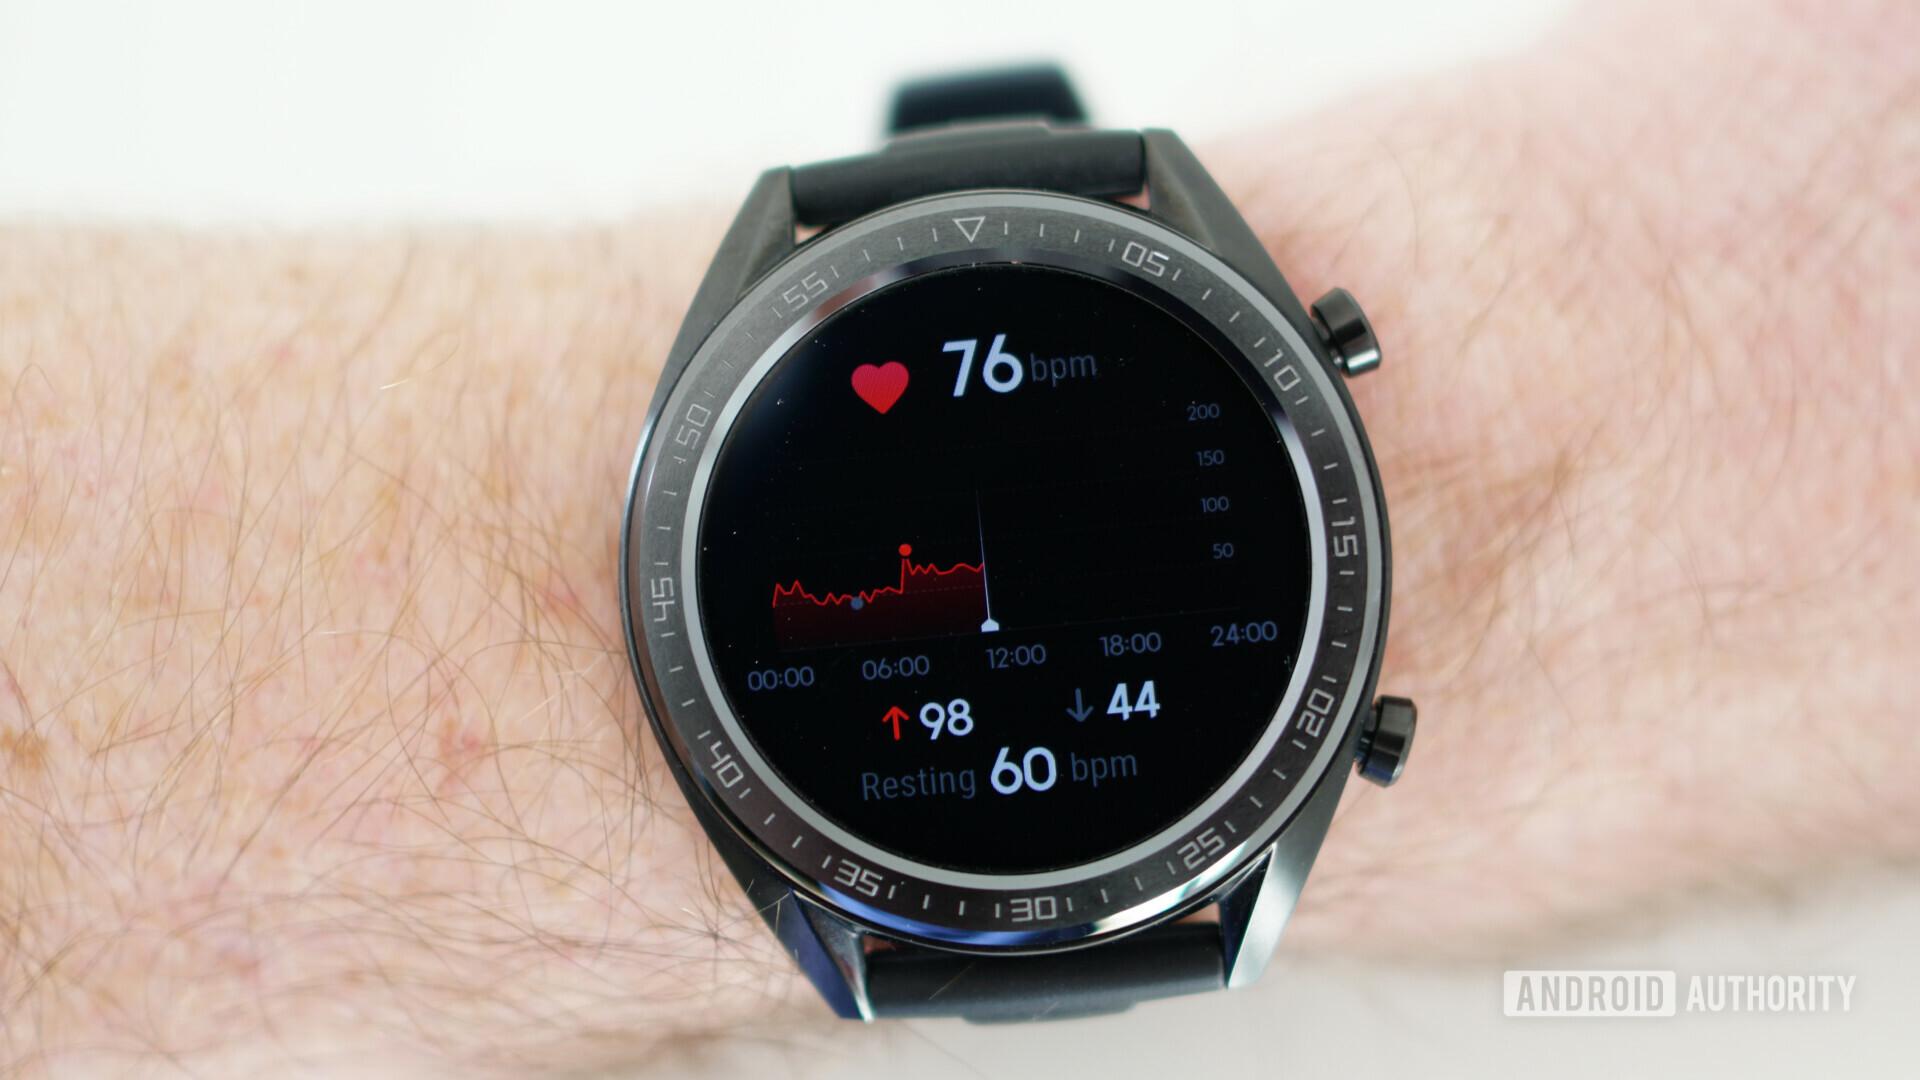 Huawei Watch GT heart rate tracking